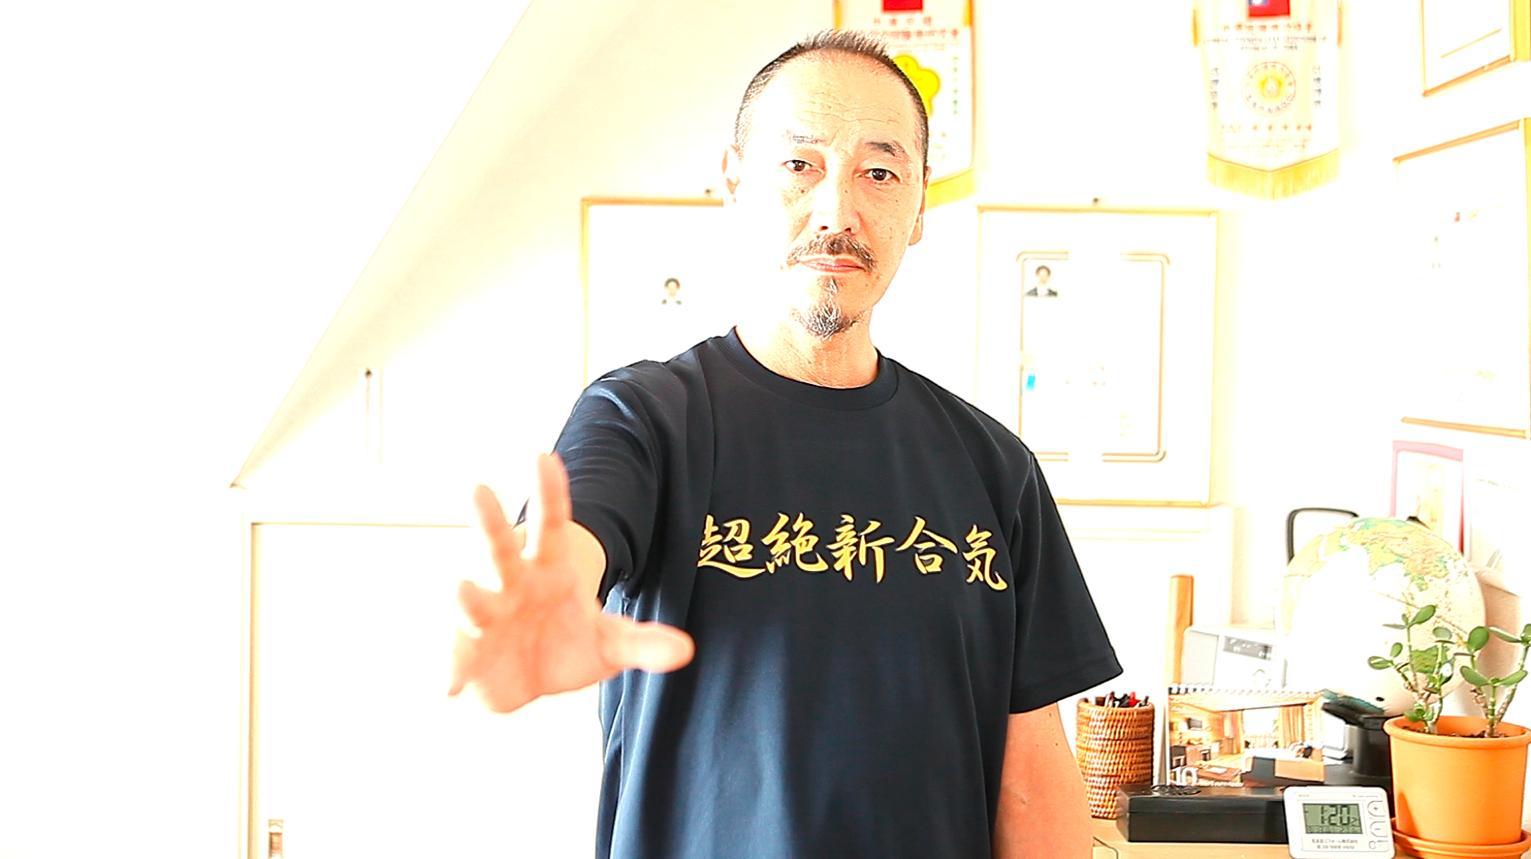 th_鈴木師匠・気-2